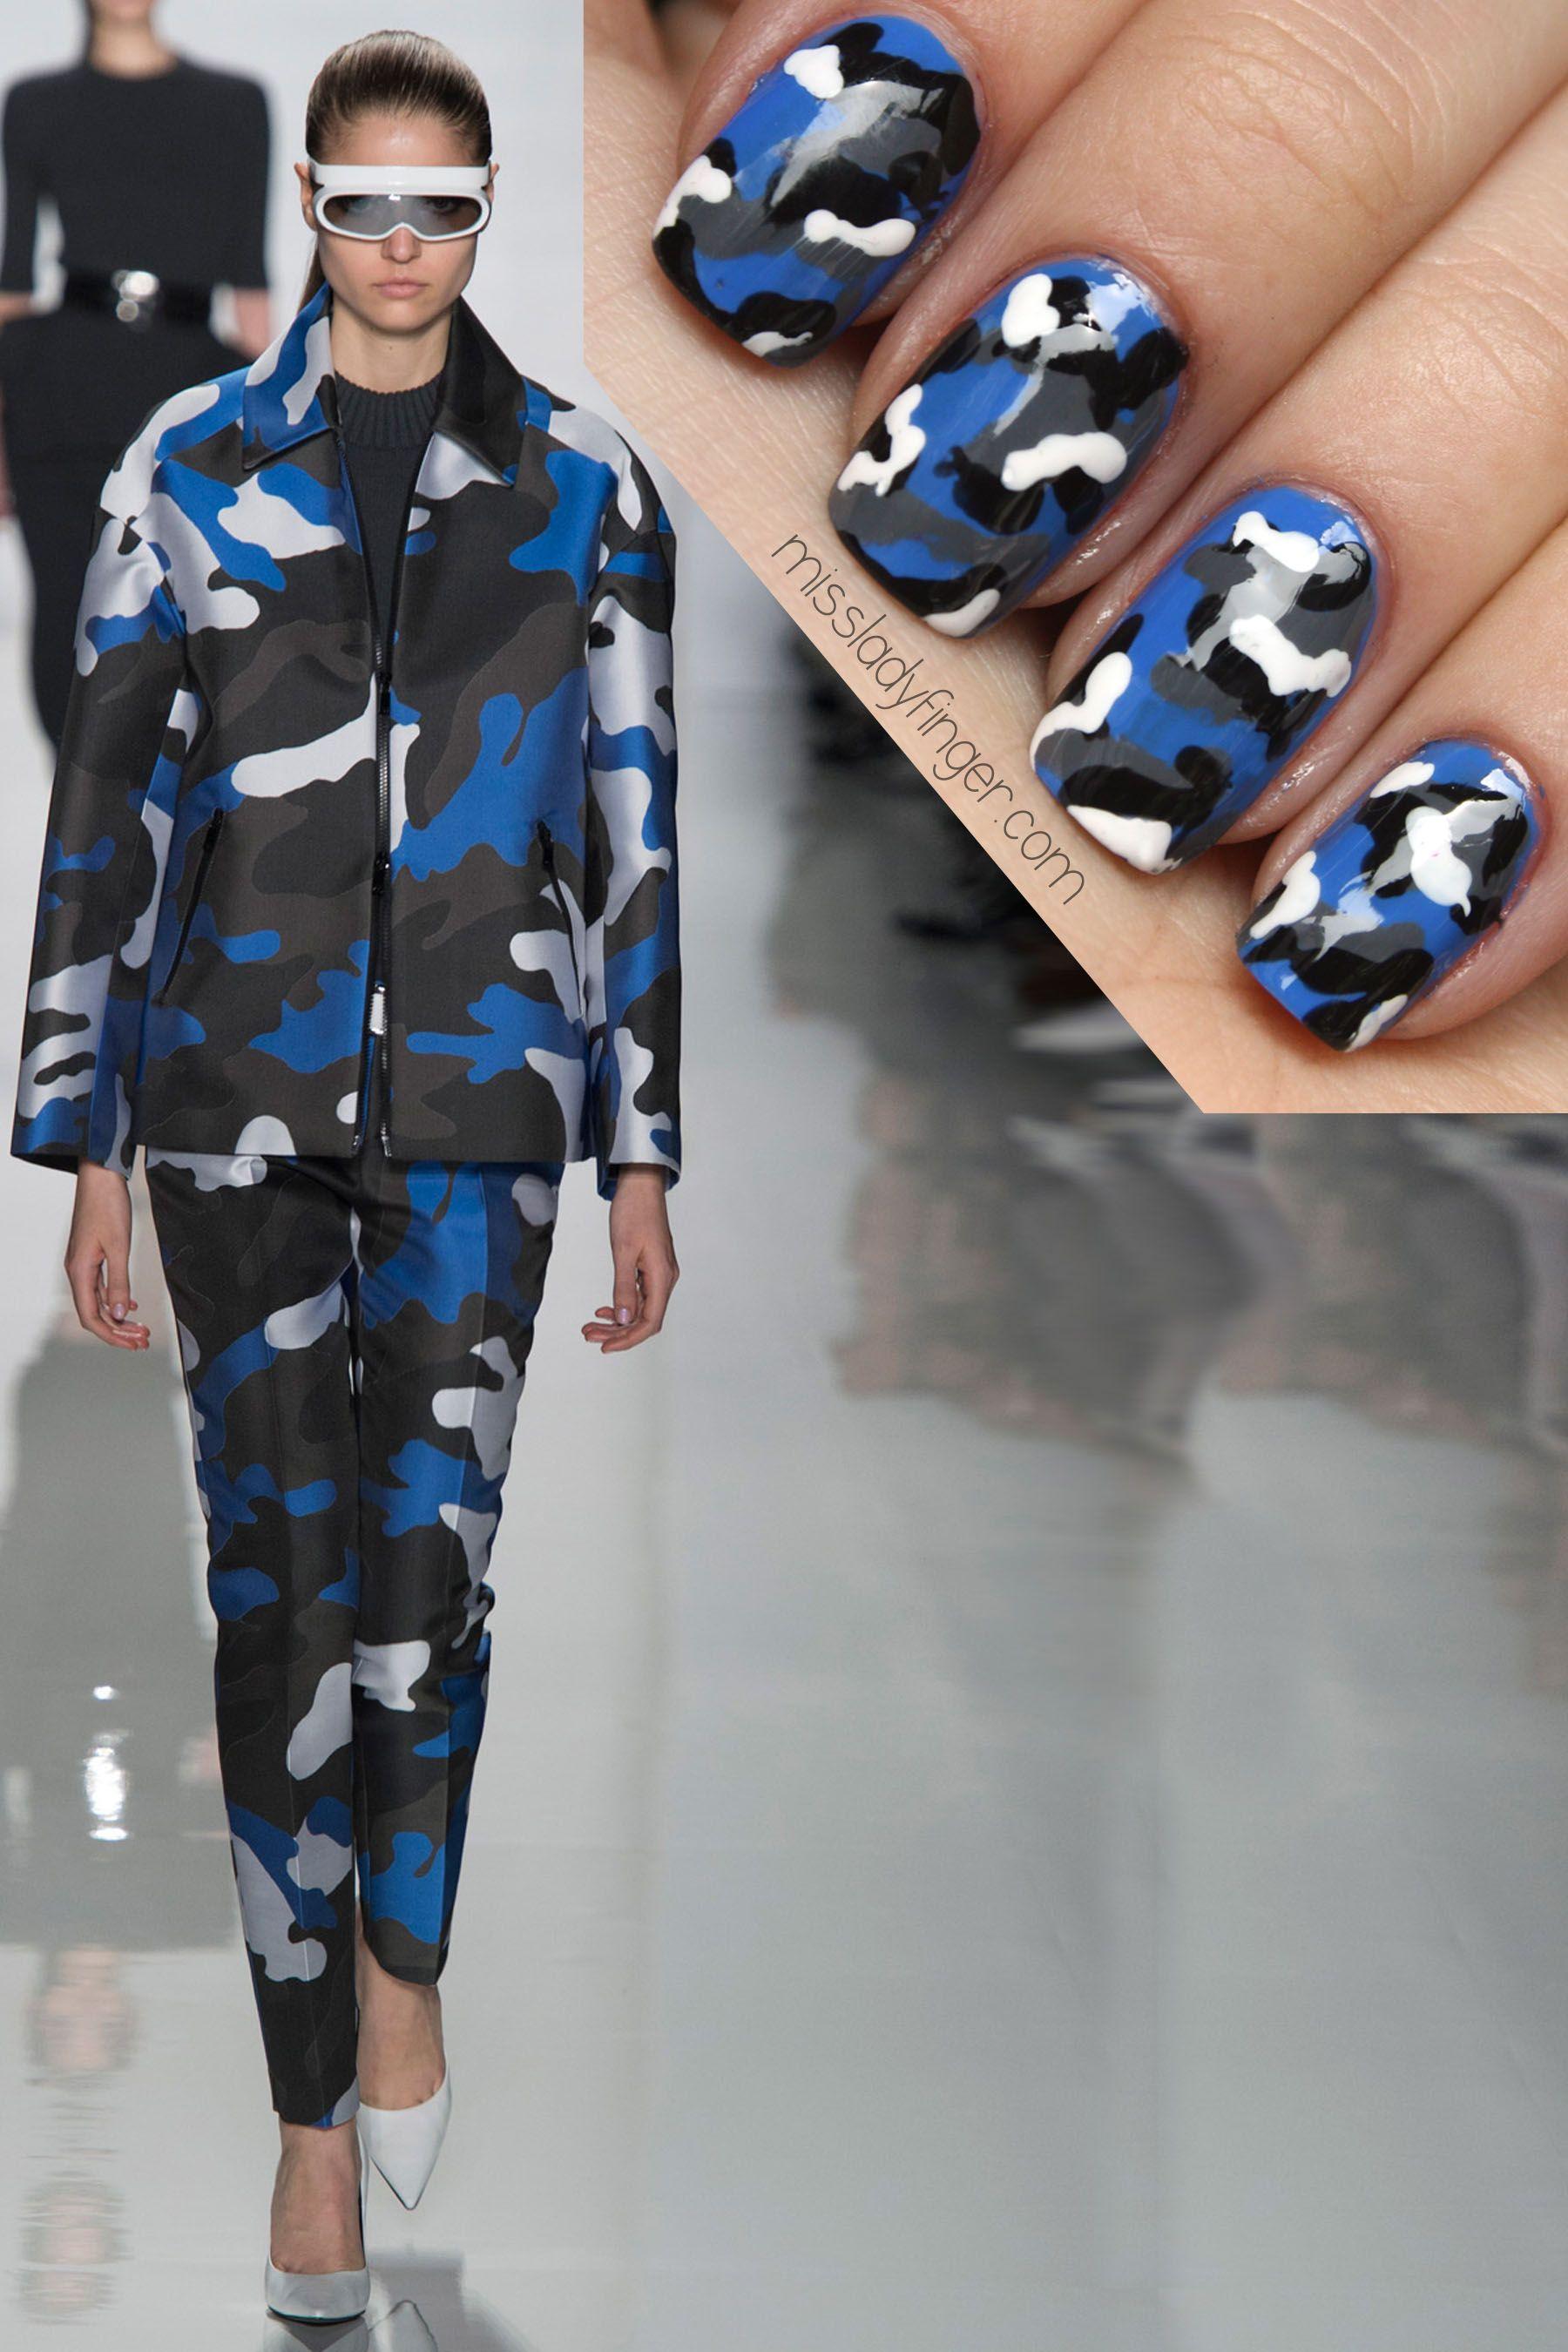 blue camo nail art inspired by fashion - Michael Kors Fall 2013 ...